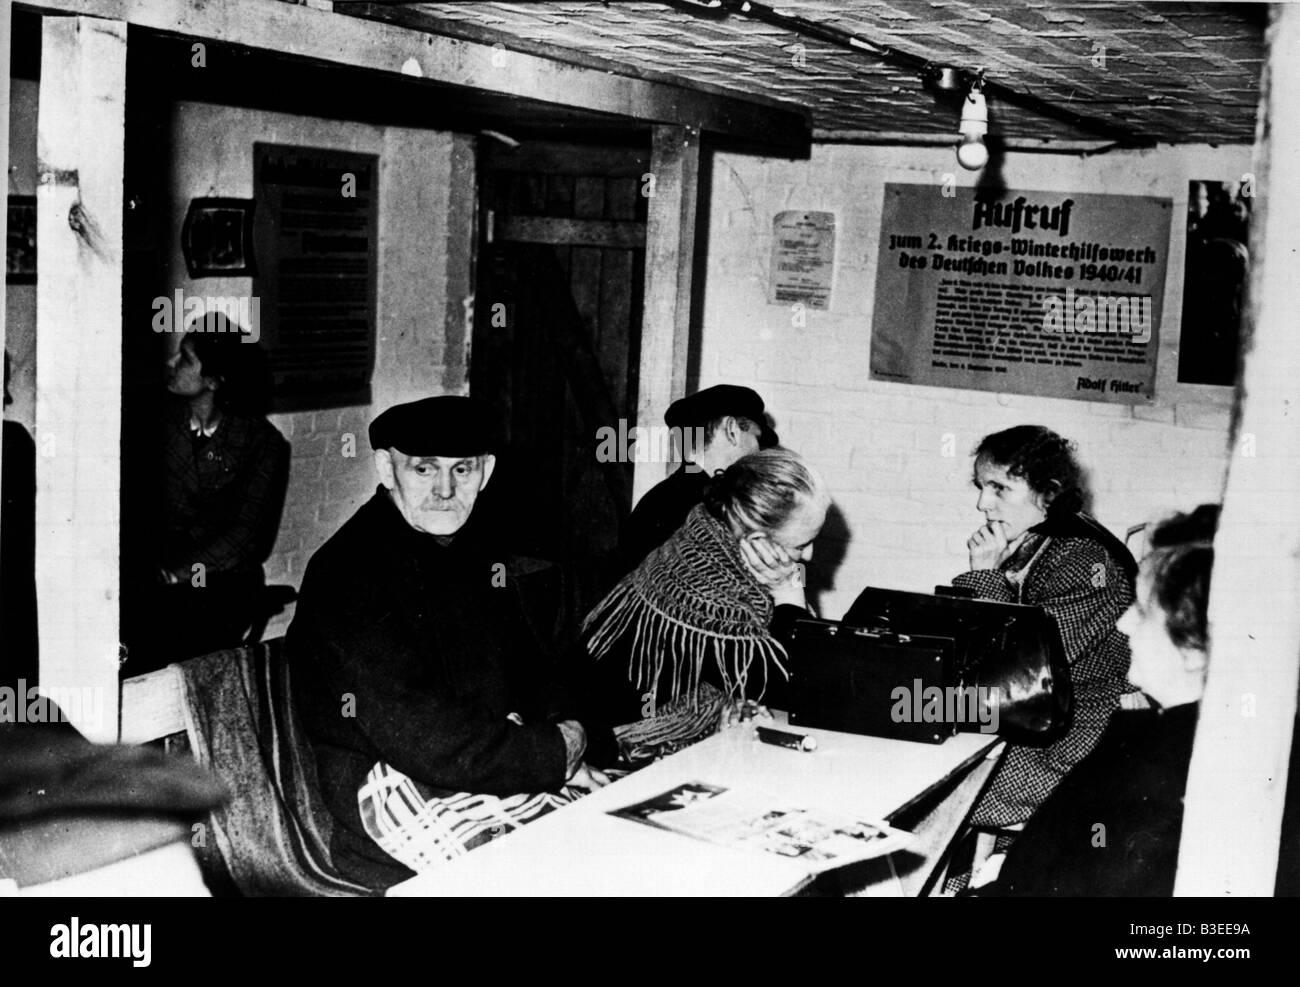 Air raid shelter / Berlin / 1940 - Stock Image